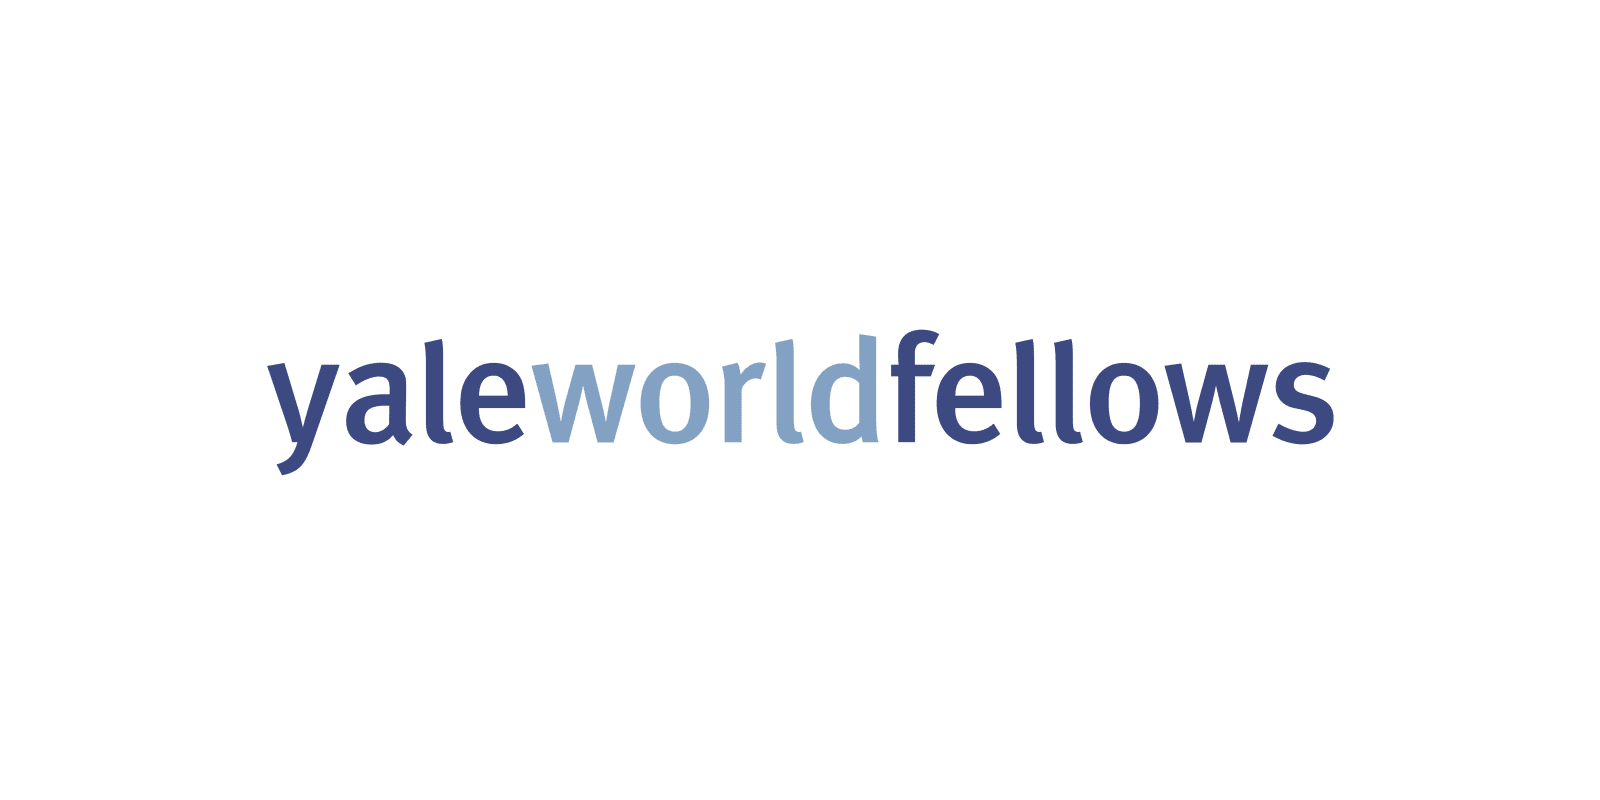 Yale World Fellowship Programme 2014